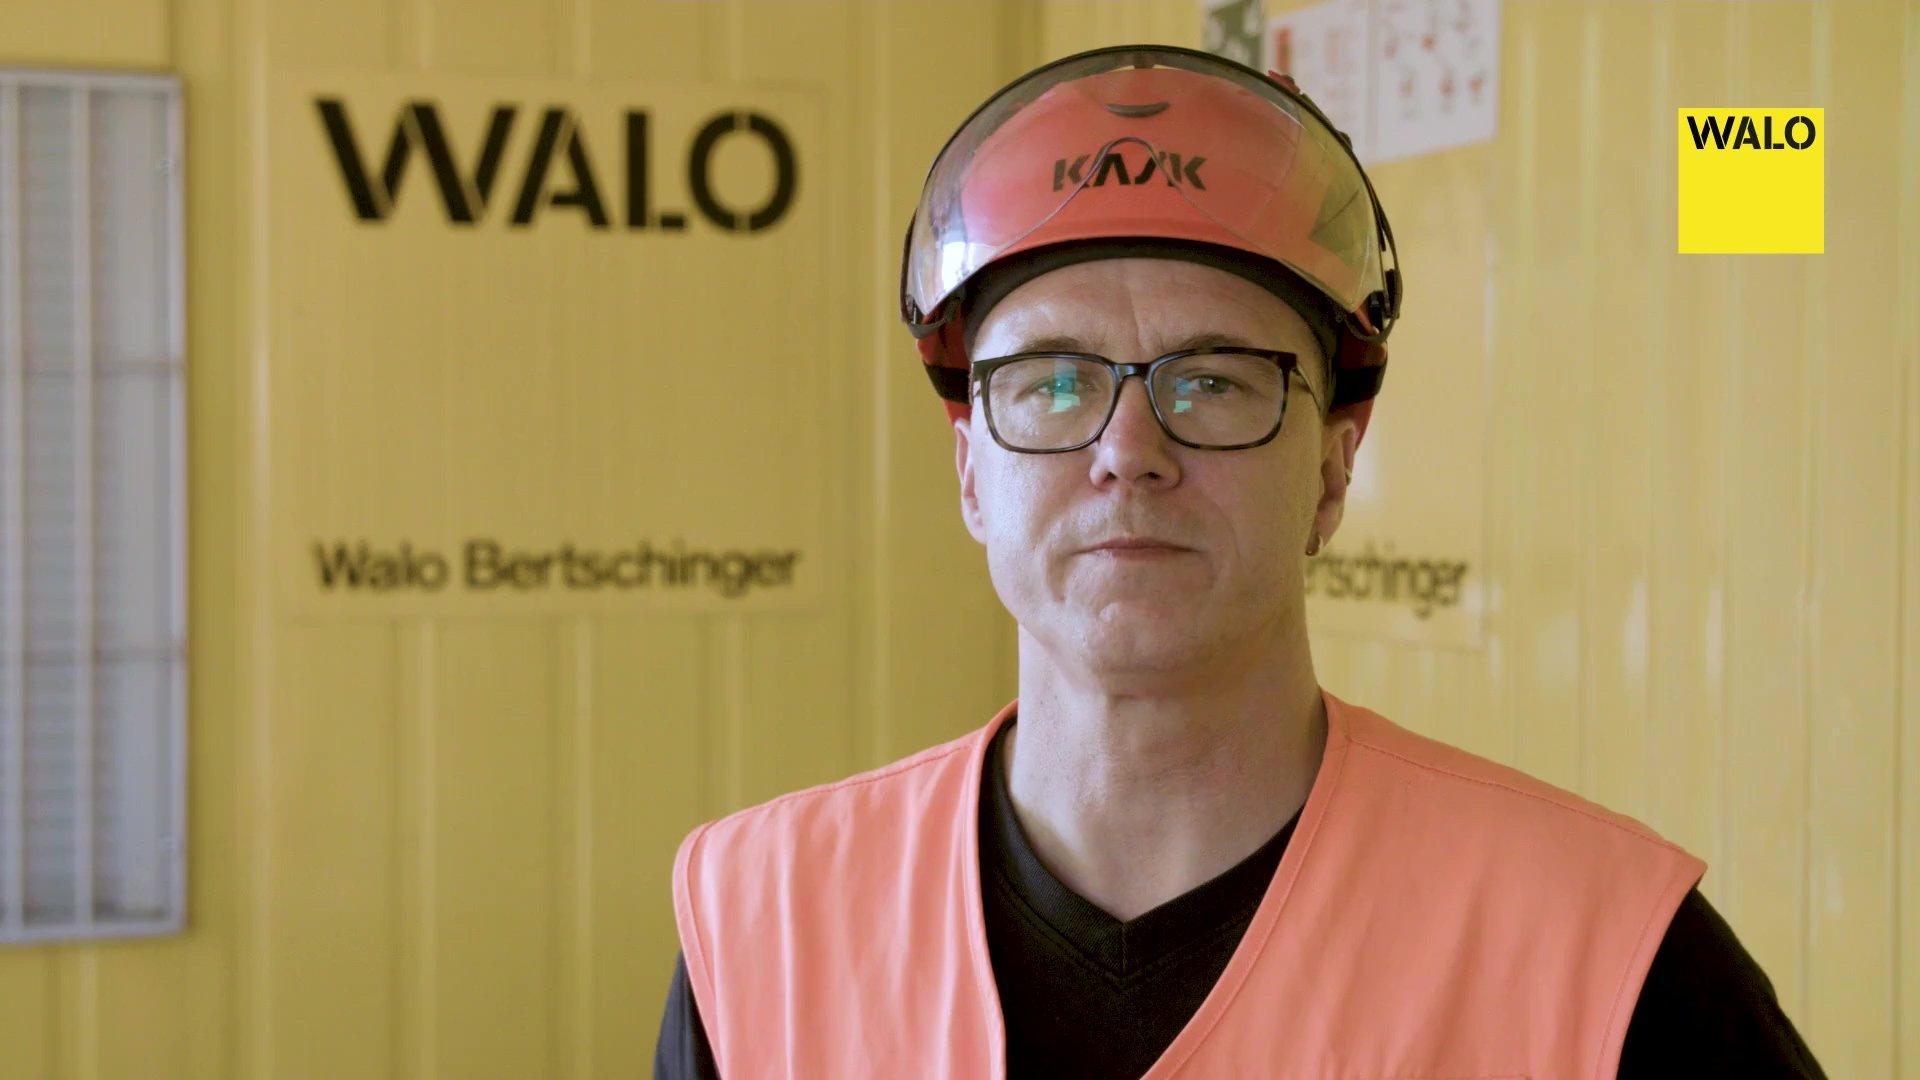 WALO_Employer Branding_Ricardo Andrade_Juergen Jacob